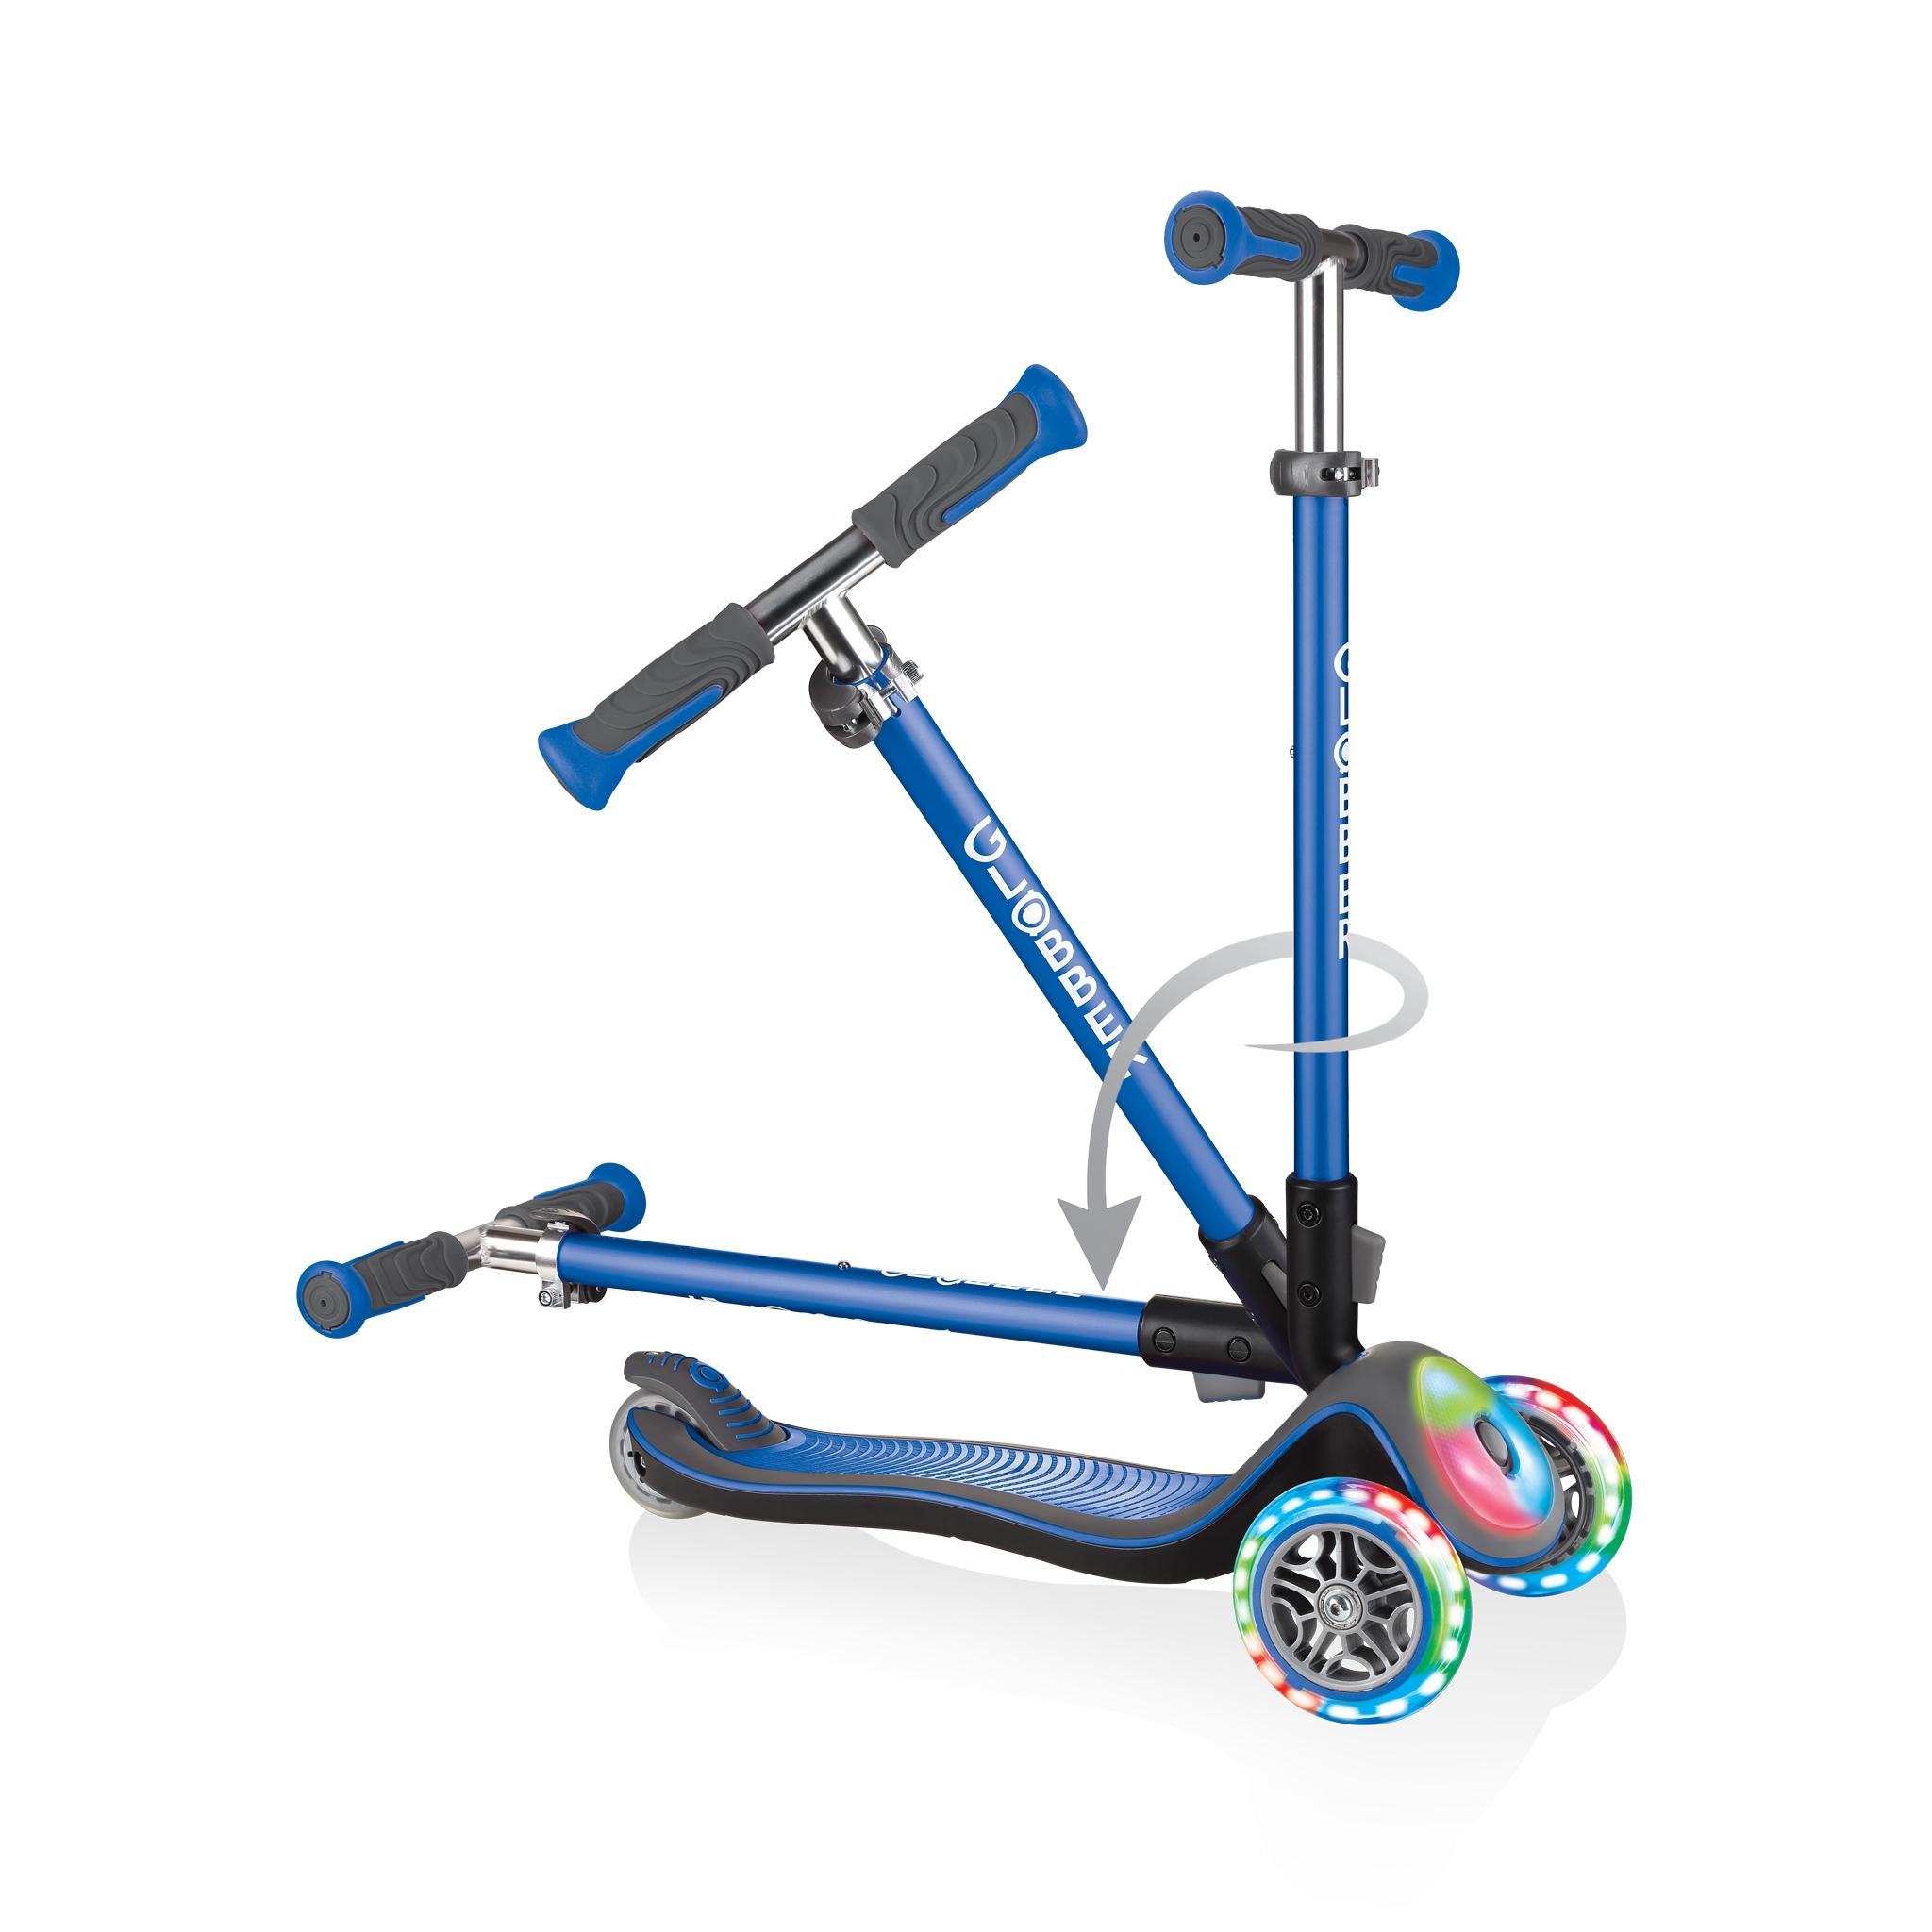 Globber-ELITE-DELUXE-FLASH-LIGHTS-3-wheel-light-up-scooter-for-kids-fold-up-scooter-navy-blue